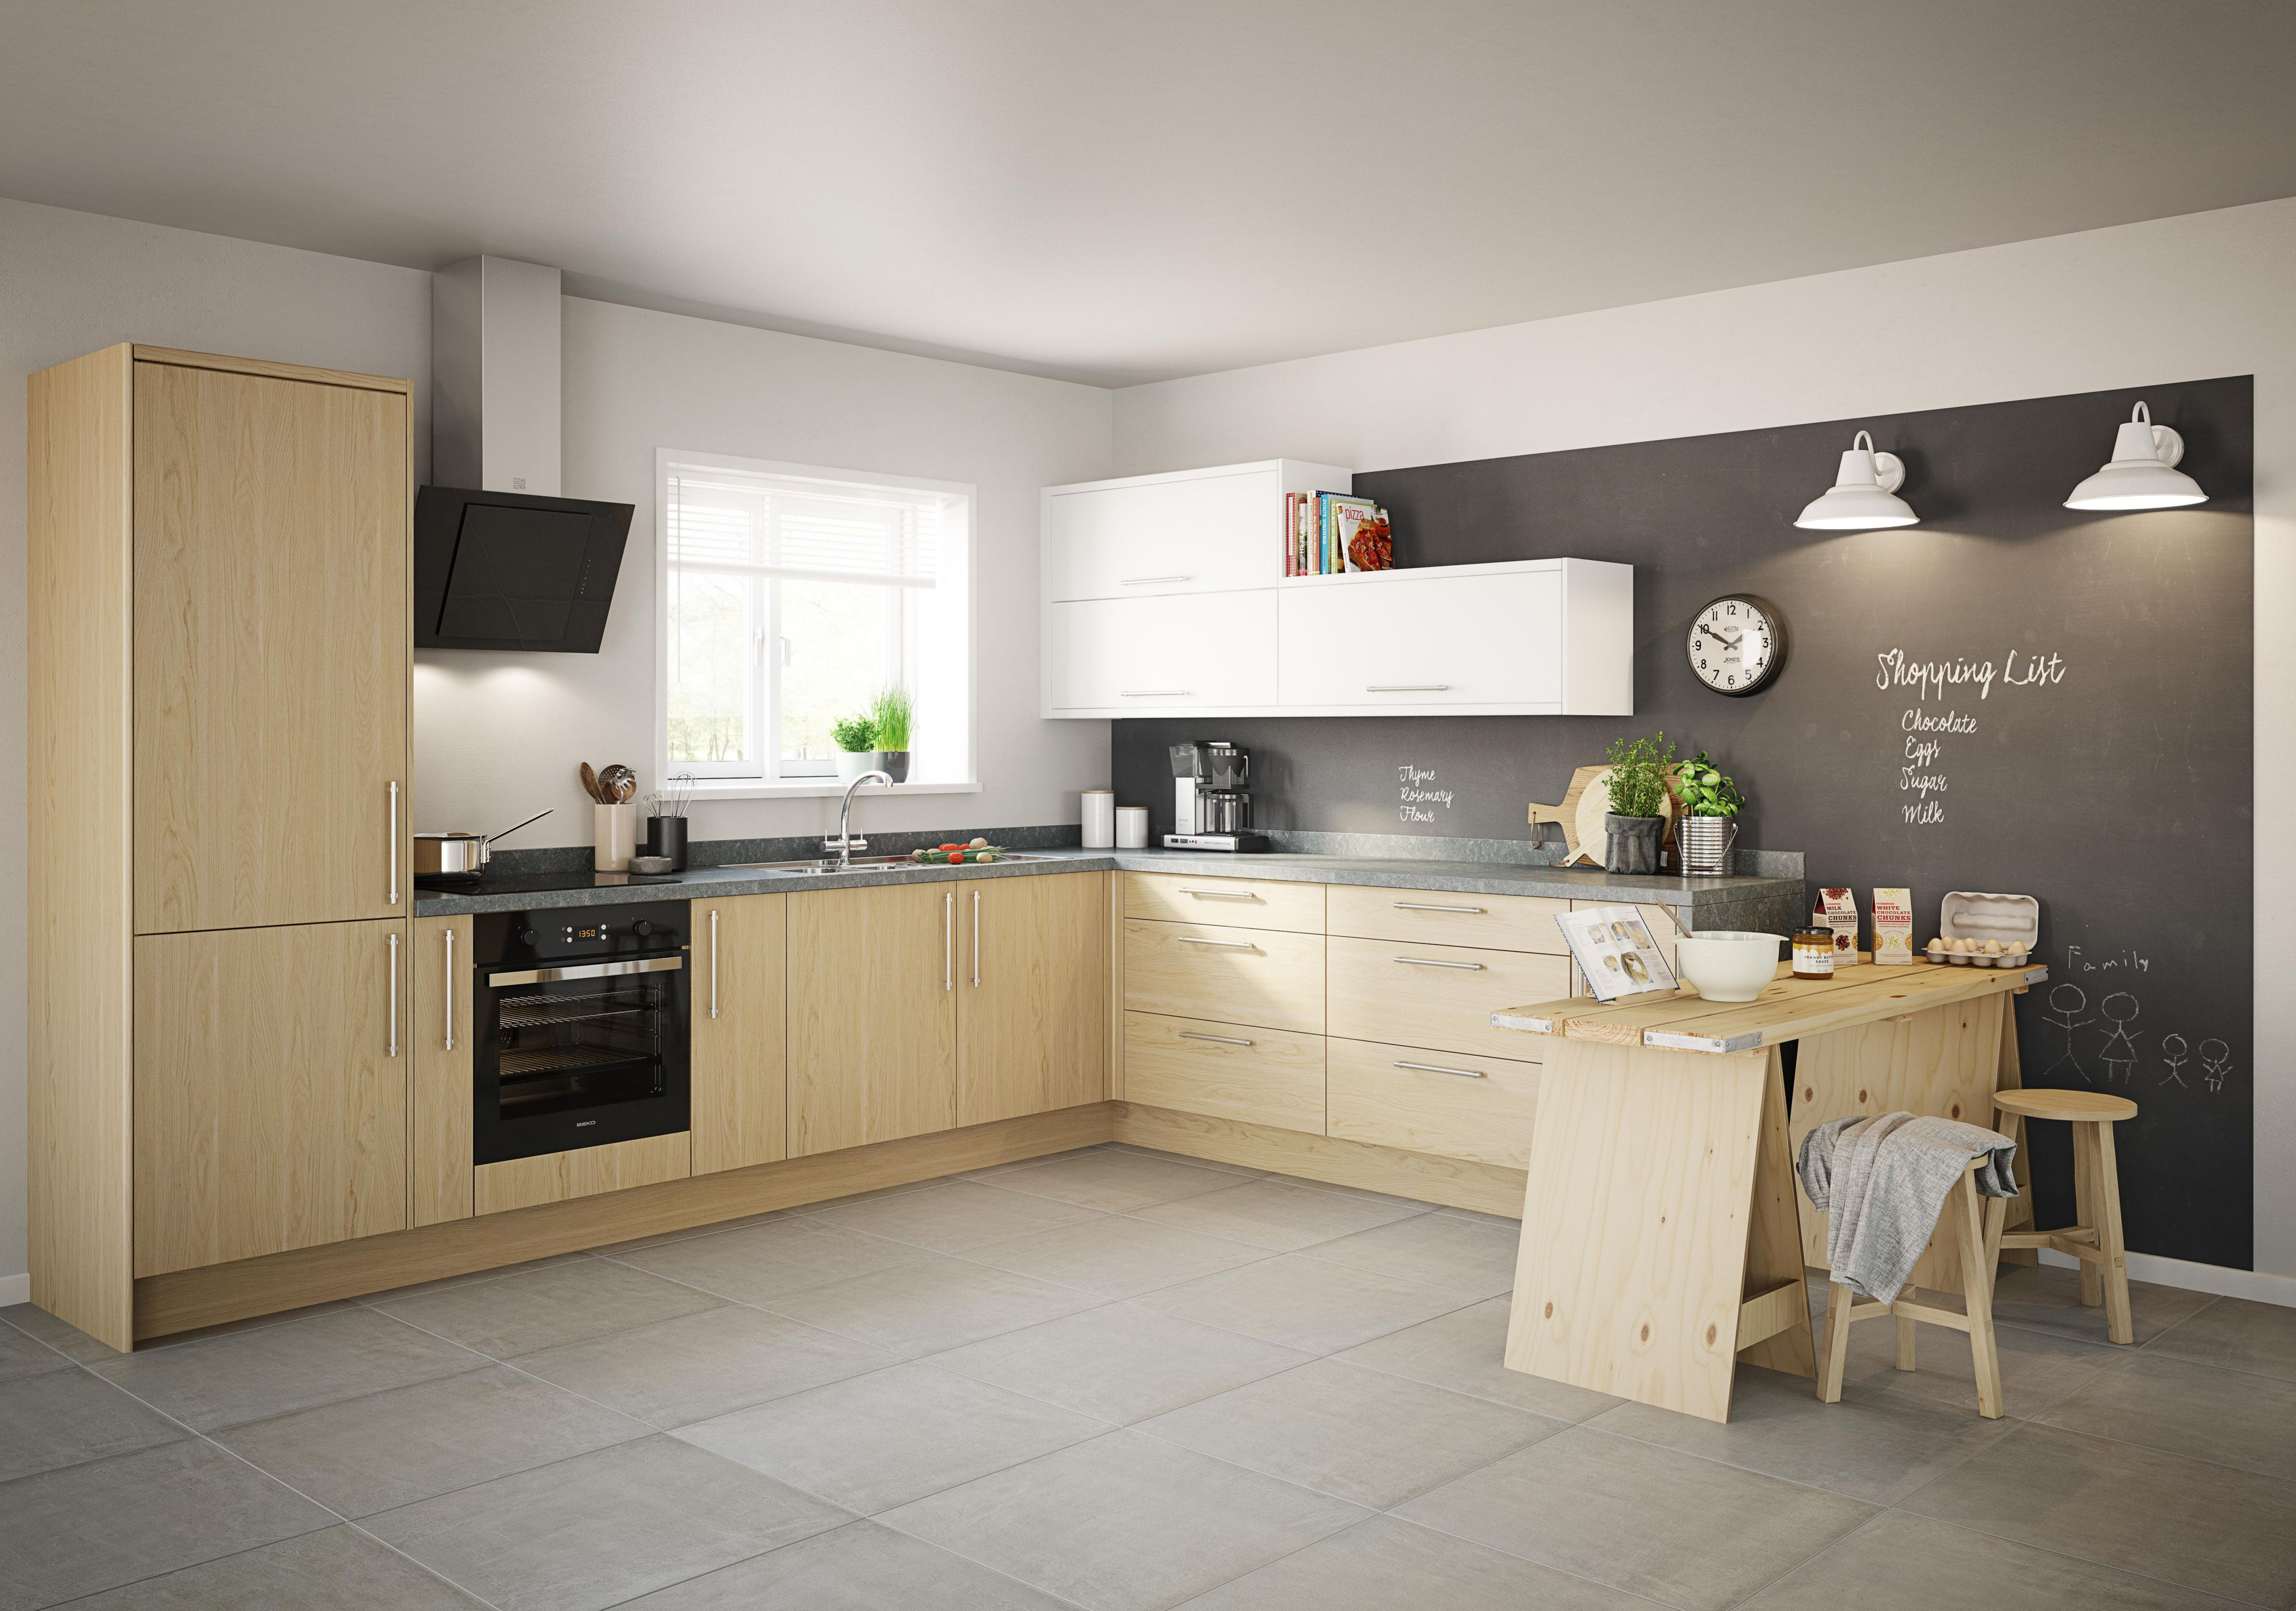 fitted kitchen sandford SLWLSNT